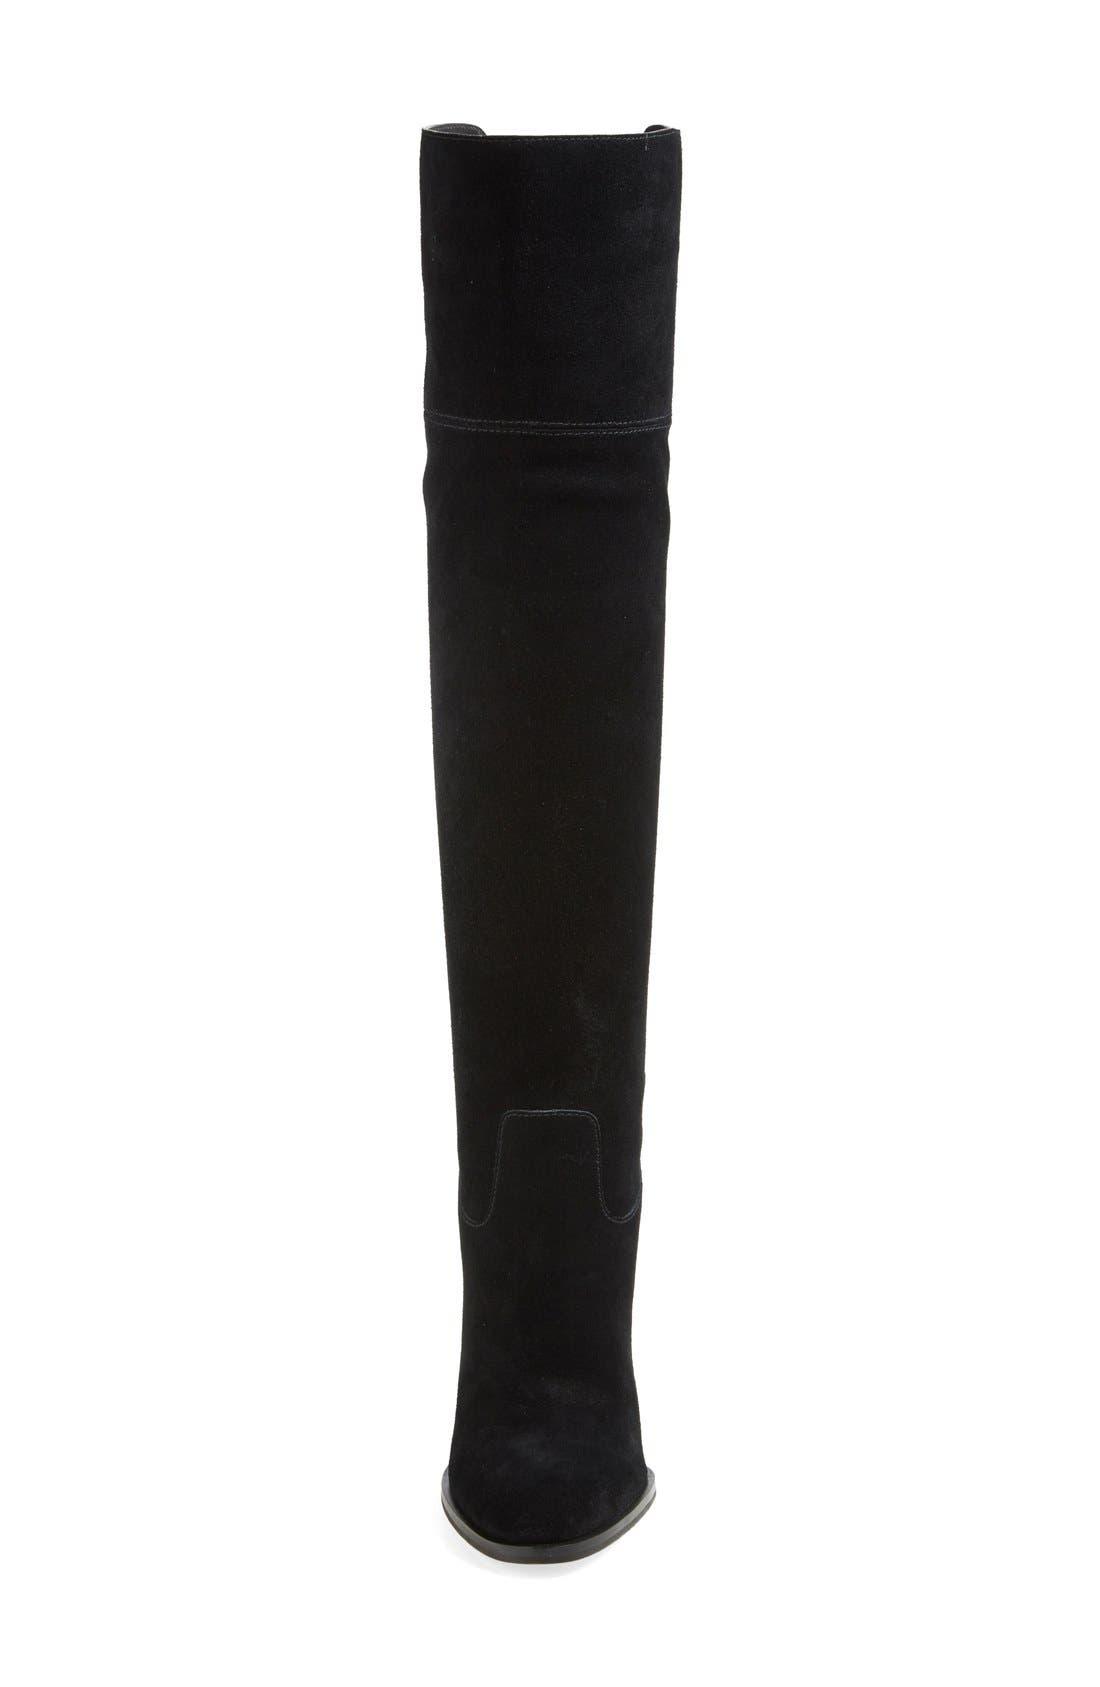 Alternate Image 3  - MICHAEL Michael Kors 'Regina' Over the Knee Boot (Women)